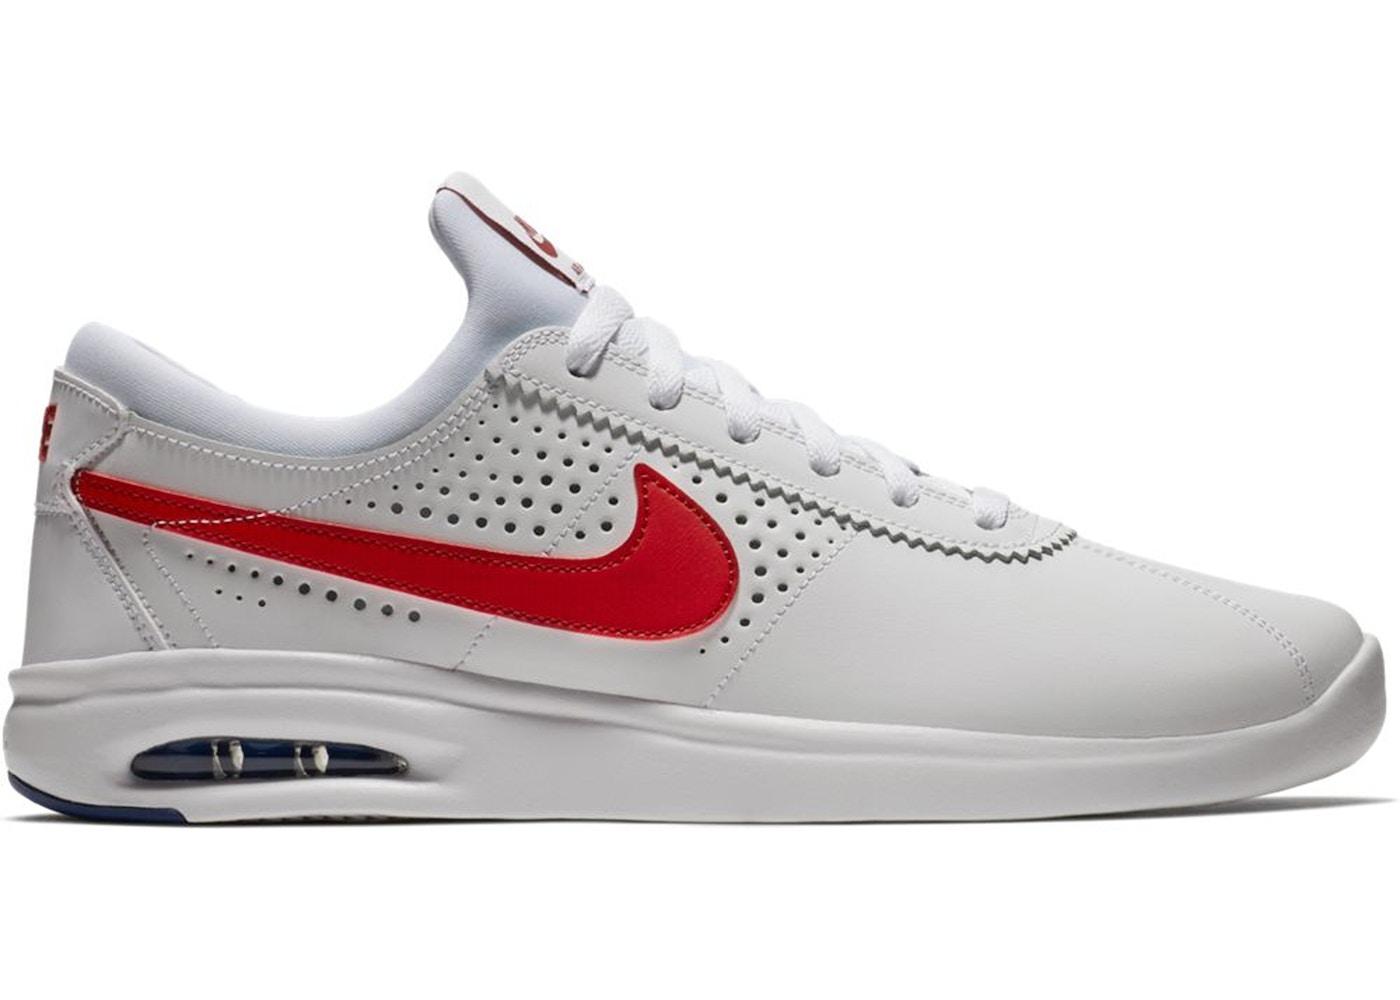 globo conductor Repegar  Nike SB Air Max Bruin Vapor White Red - 882097-100